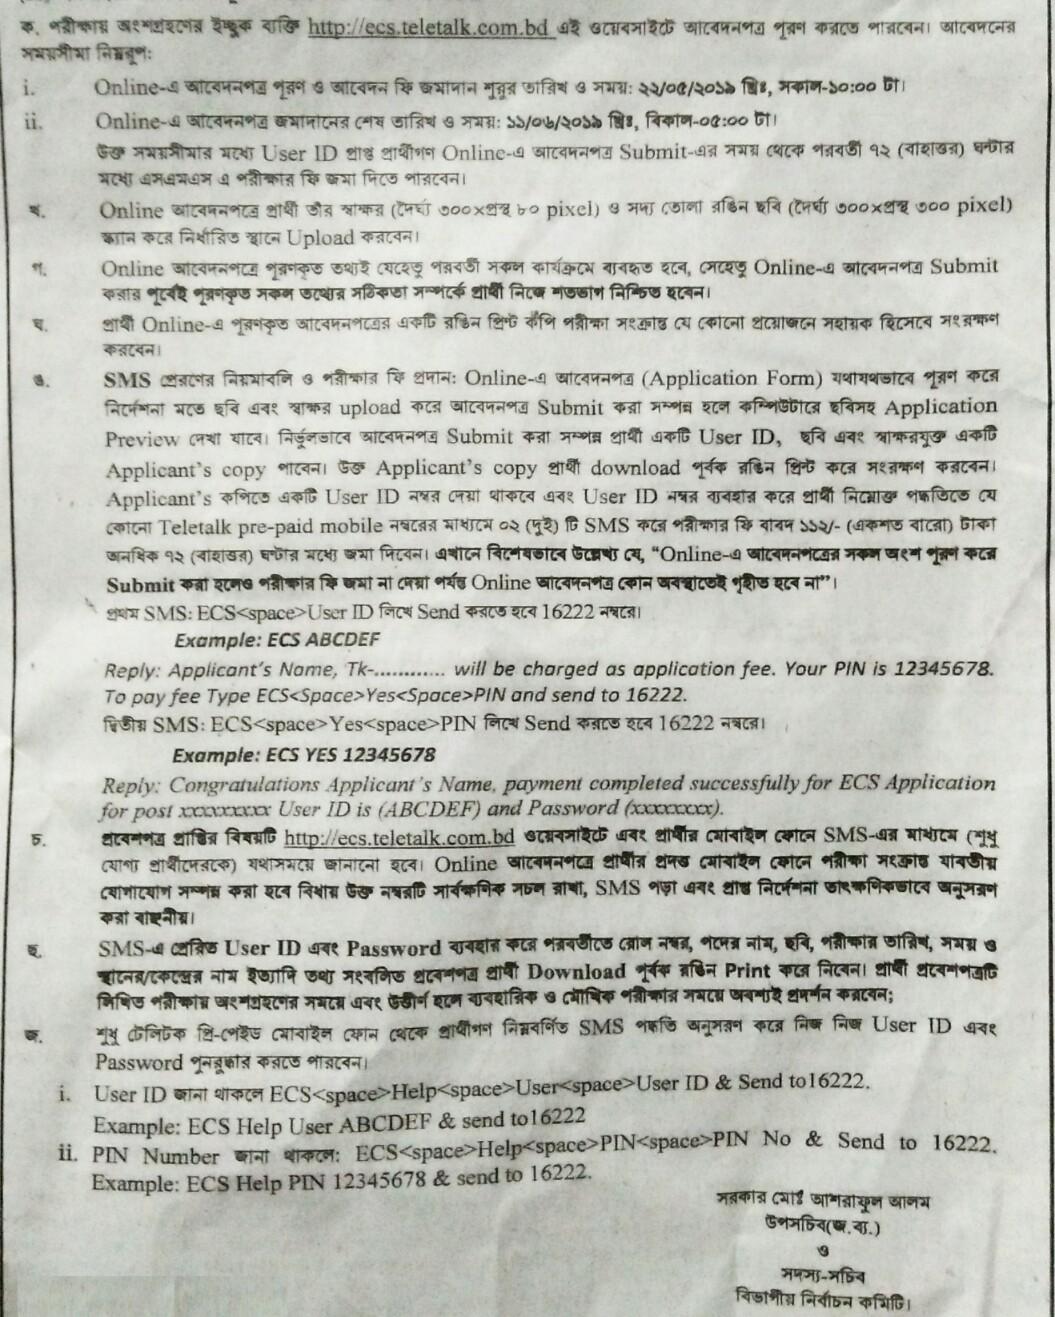 Bangladesh Election Commission and its field level job circular 2019. বাংলাদেশ নির্বাচন কমিশন ও এর আওতাধীন মাঠ পর্যায় নিয়োগ বিজ্ঞপ্তি ২০১৯